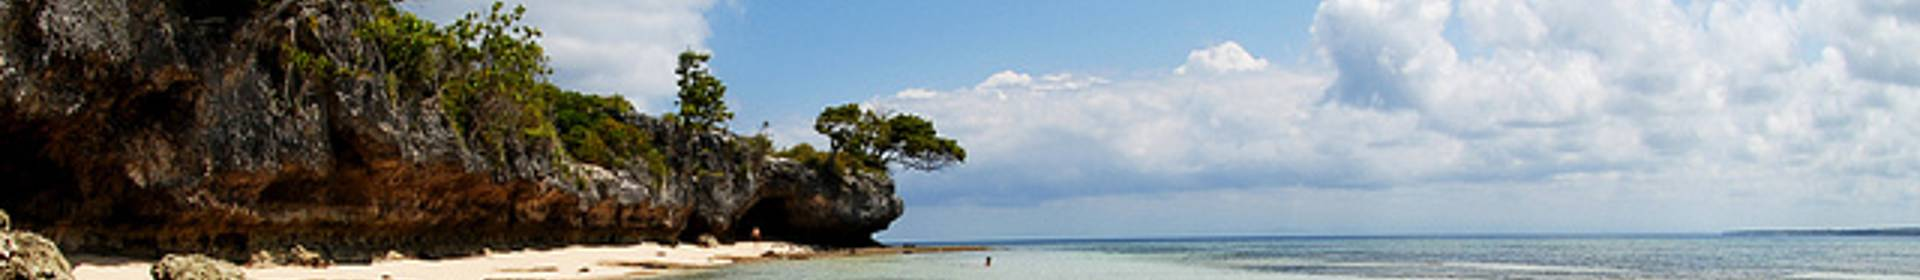 Isla de Liukan